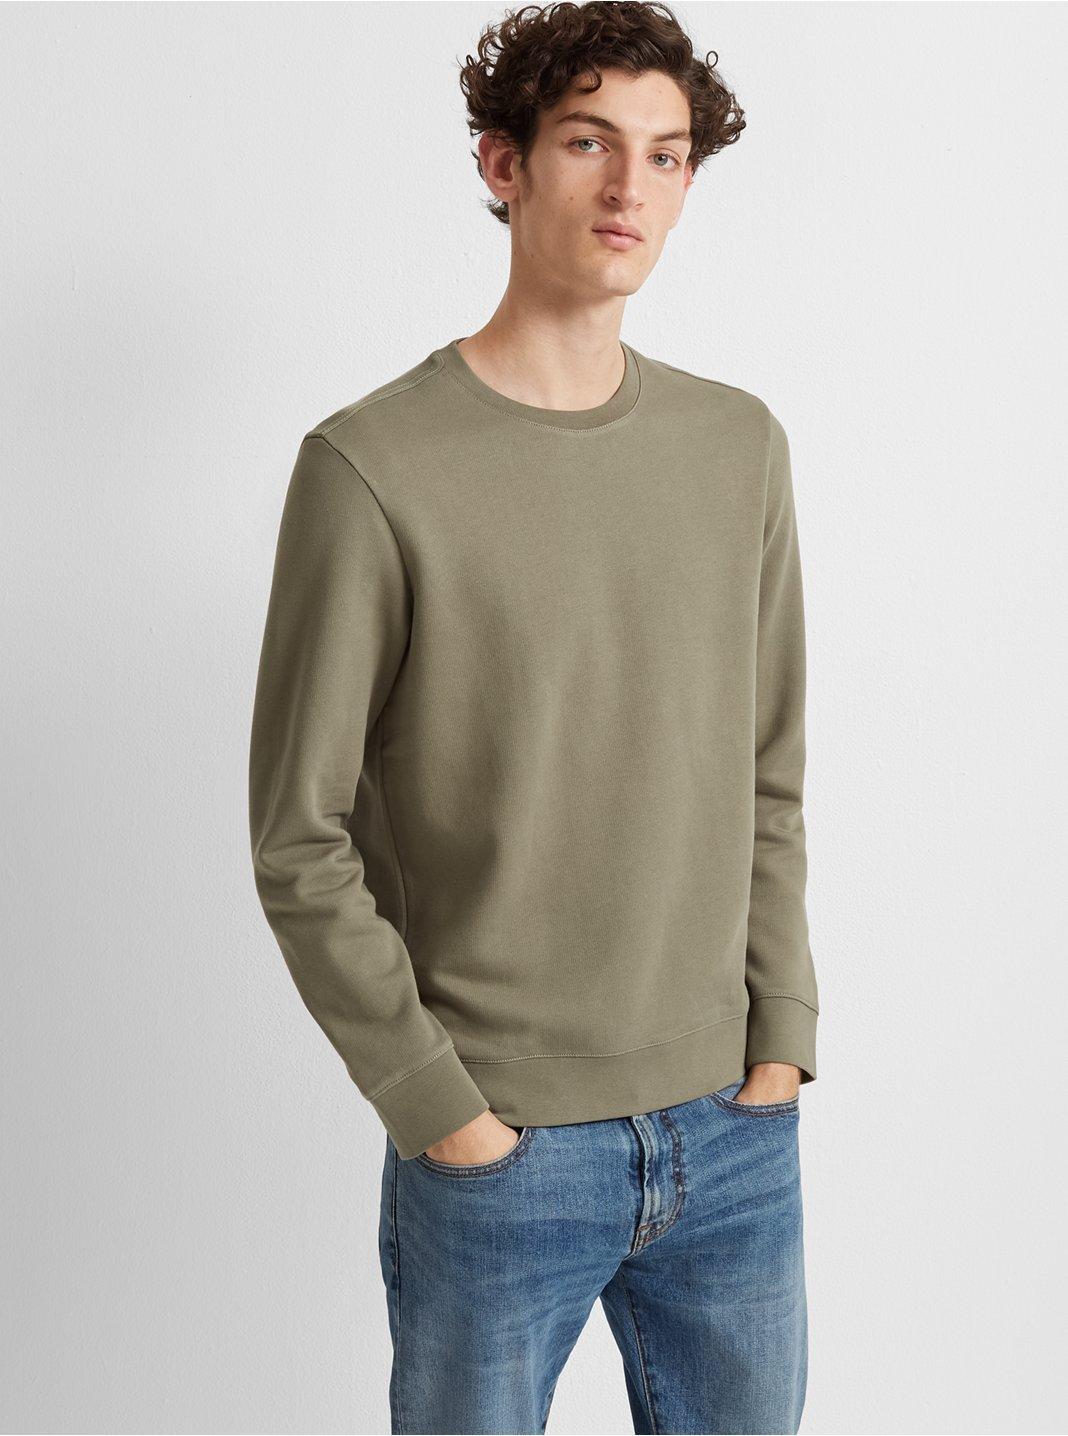 Piece-Dyed Sweatshirt